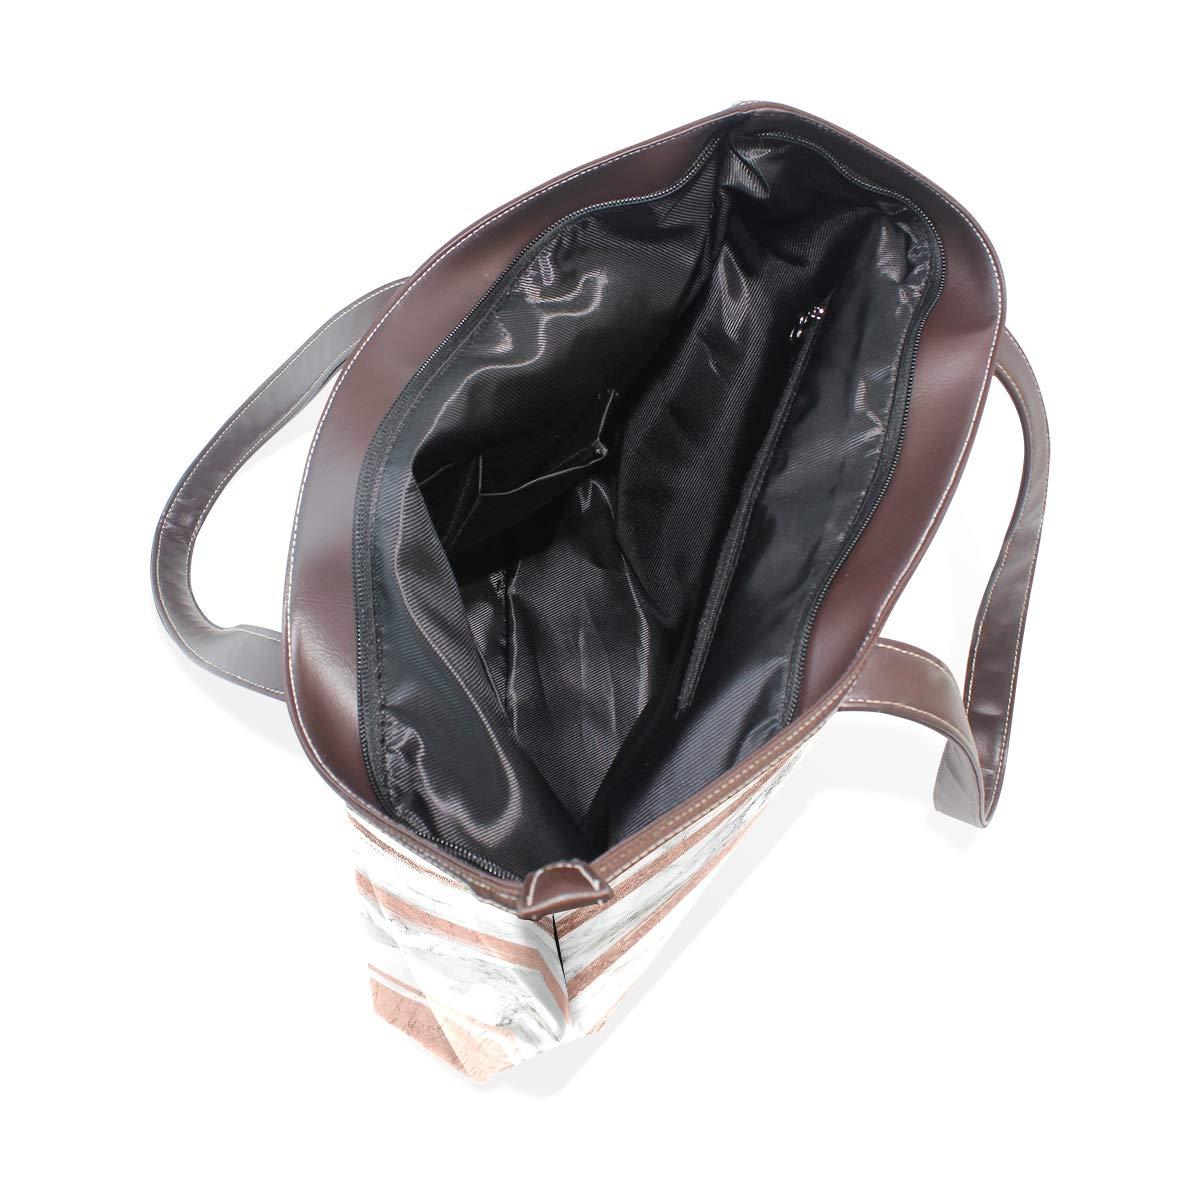 Rose Gold Stripe MarbleWomens Vintage Leather Tote Urban Style Satchel Tote